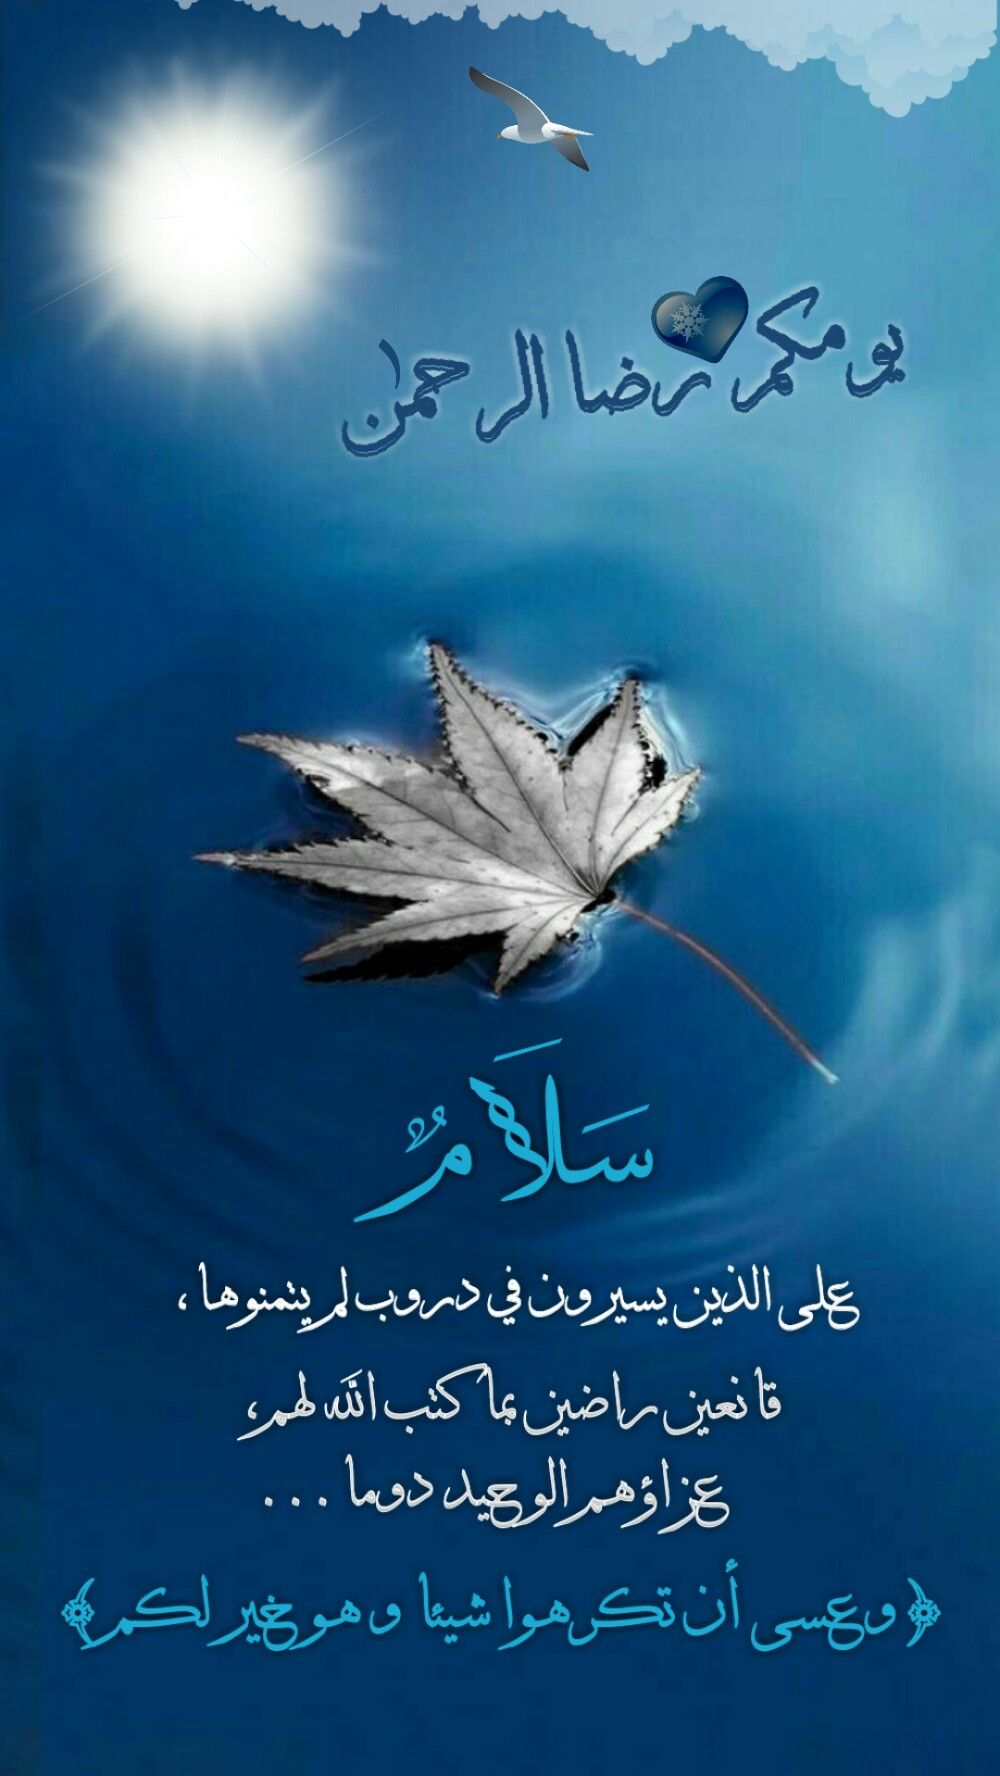 Pin By Ranya Anis On صباح الخير Books To Read Books Poster